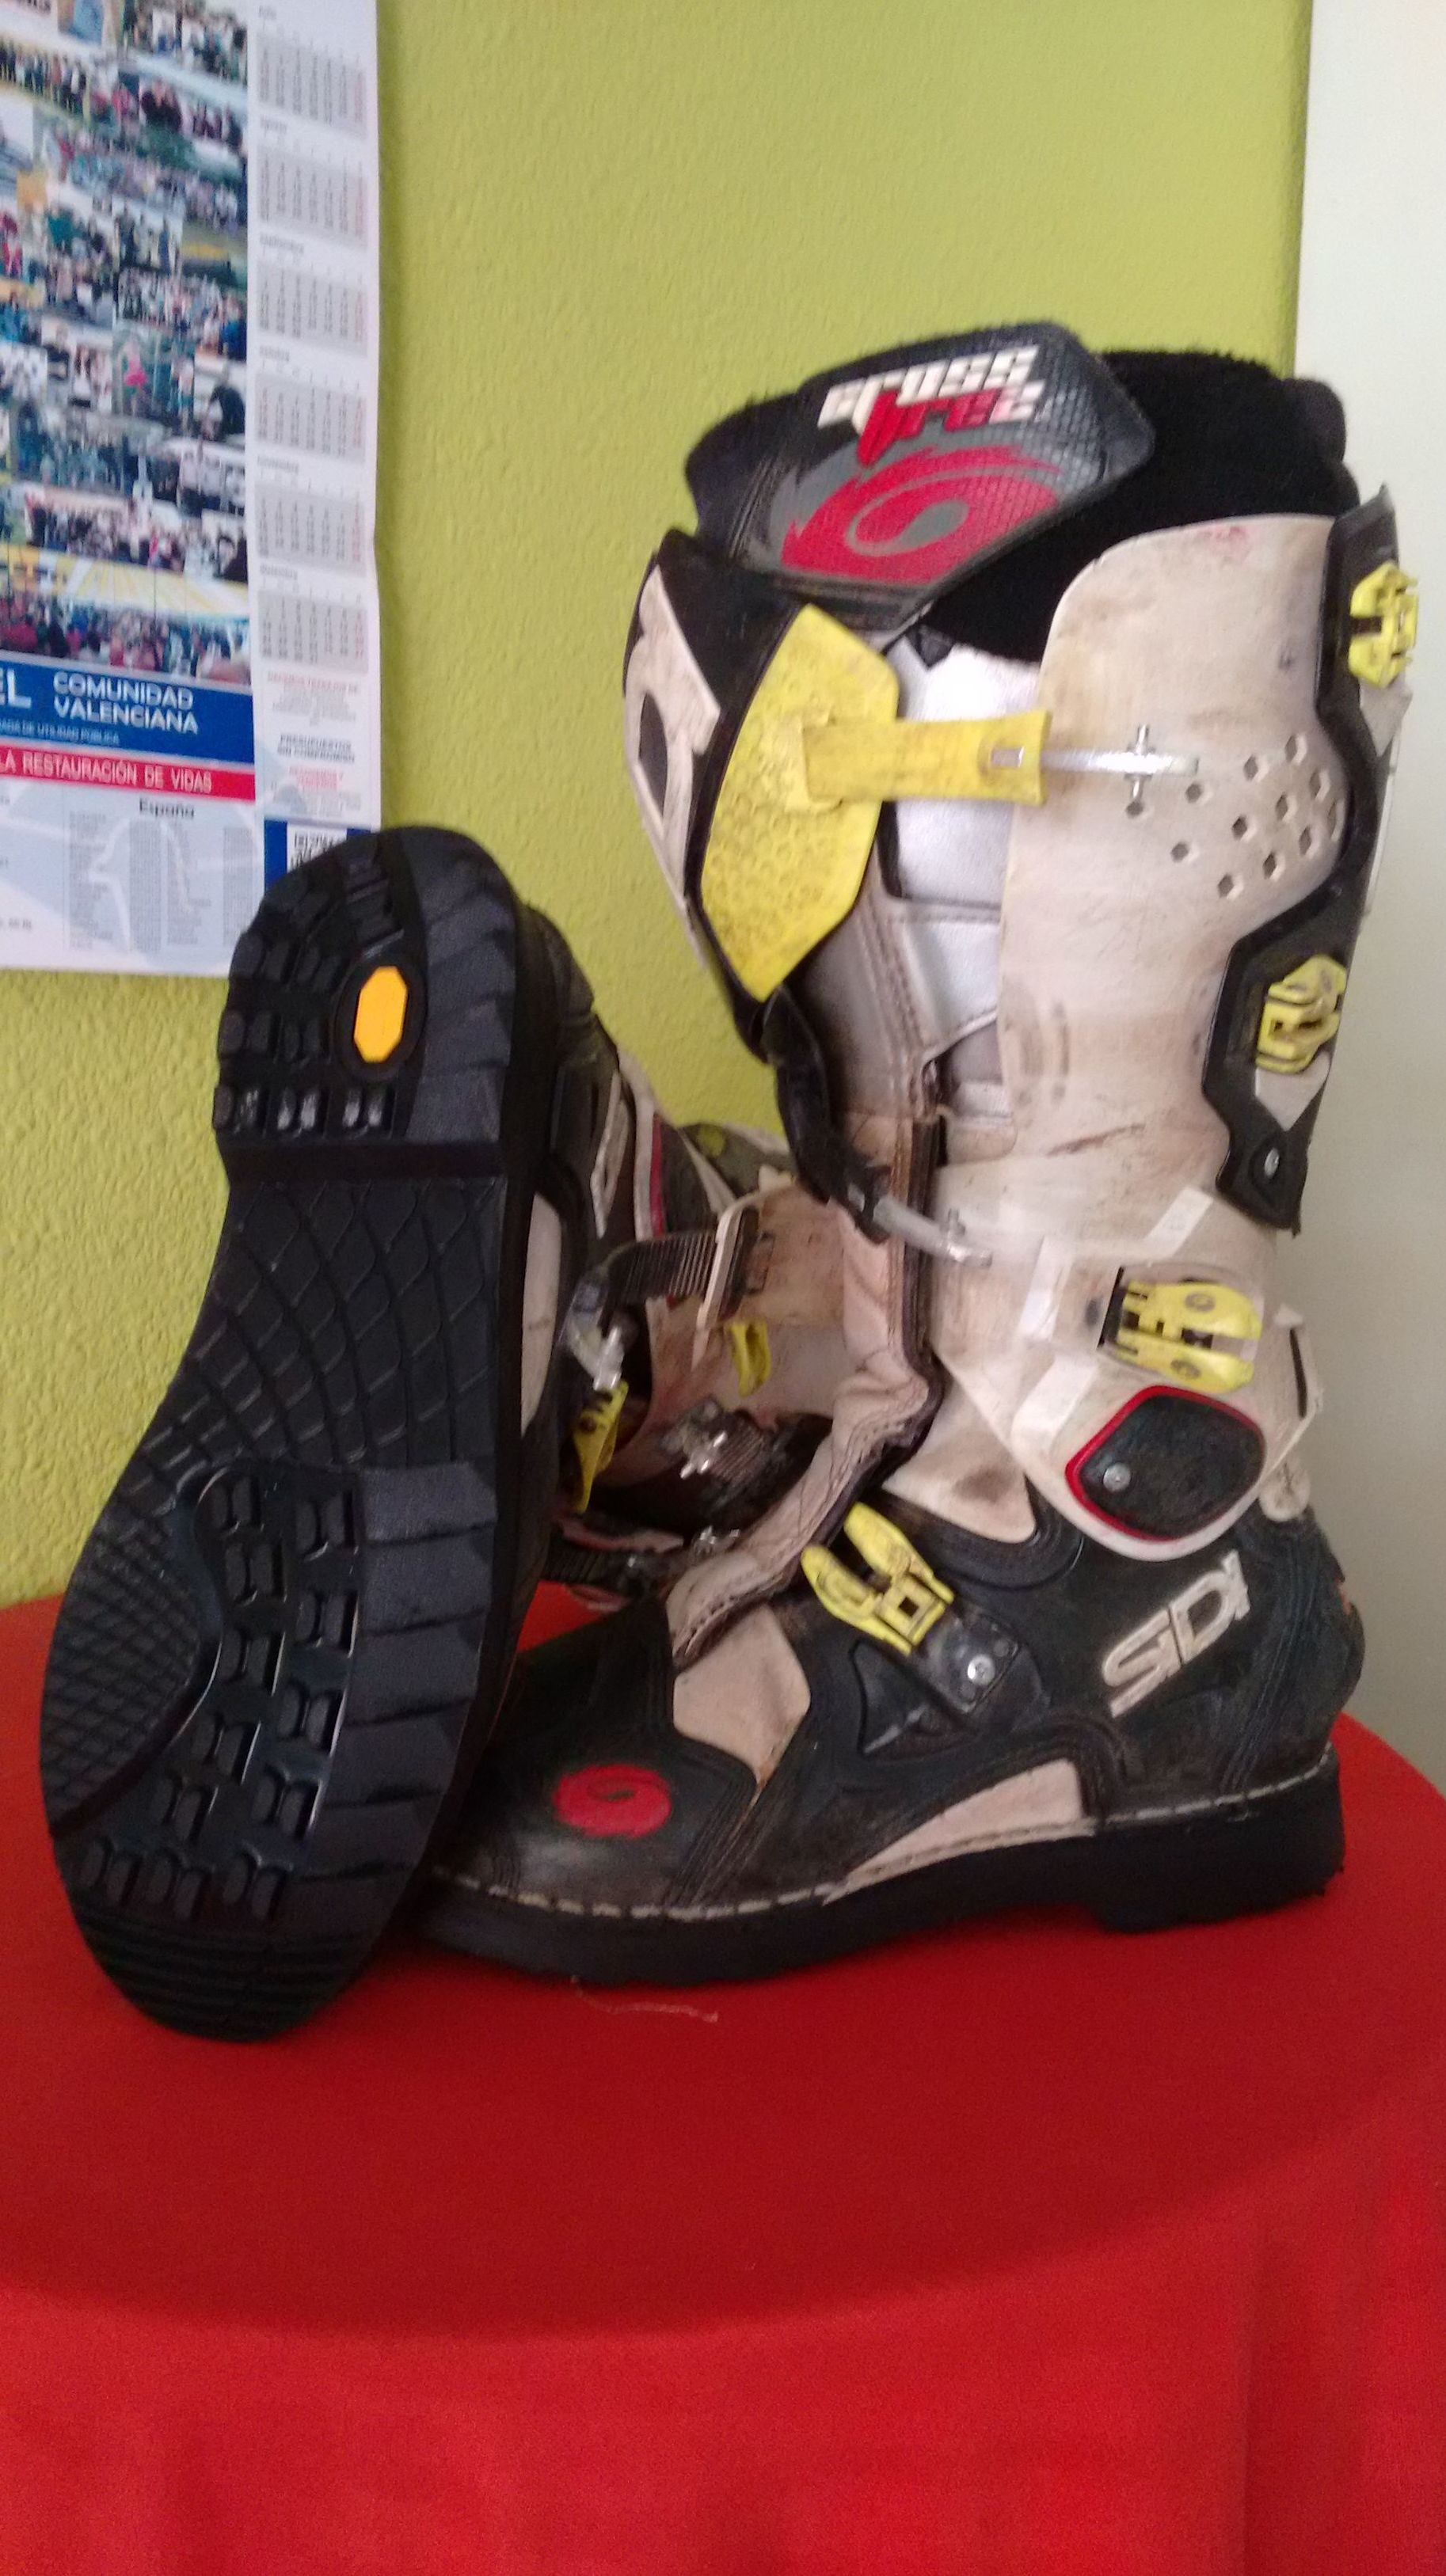 Foto 50 de Reparación de calzado en Castellón | Roig Vidal